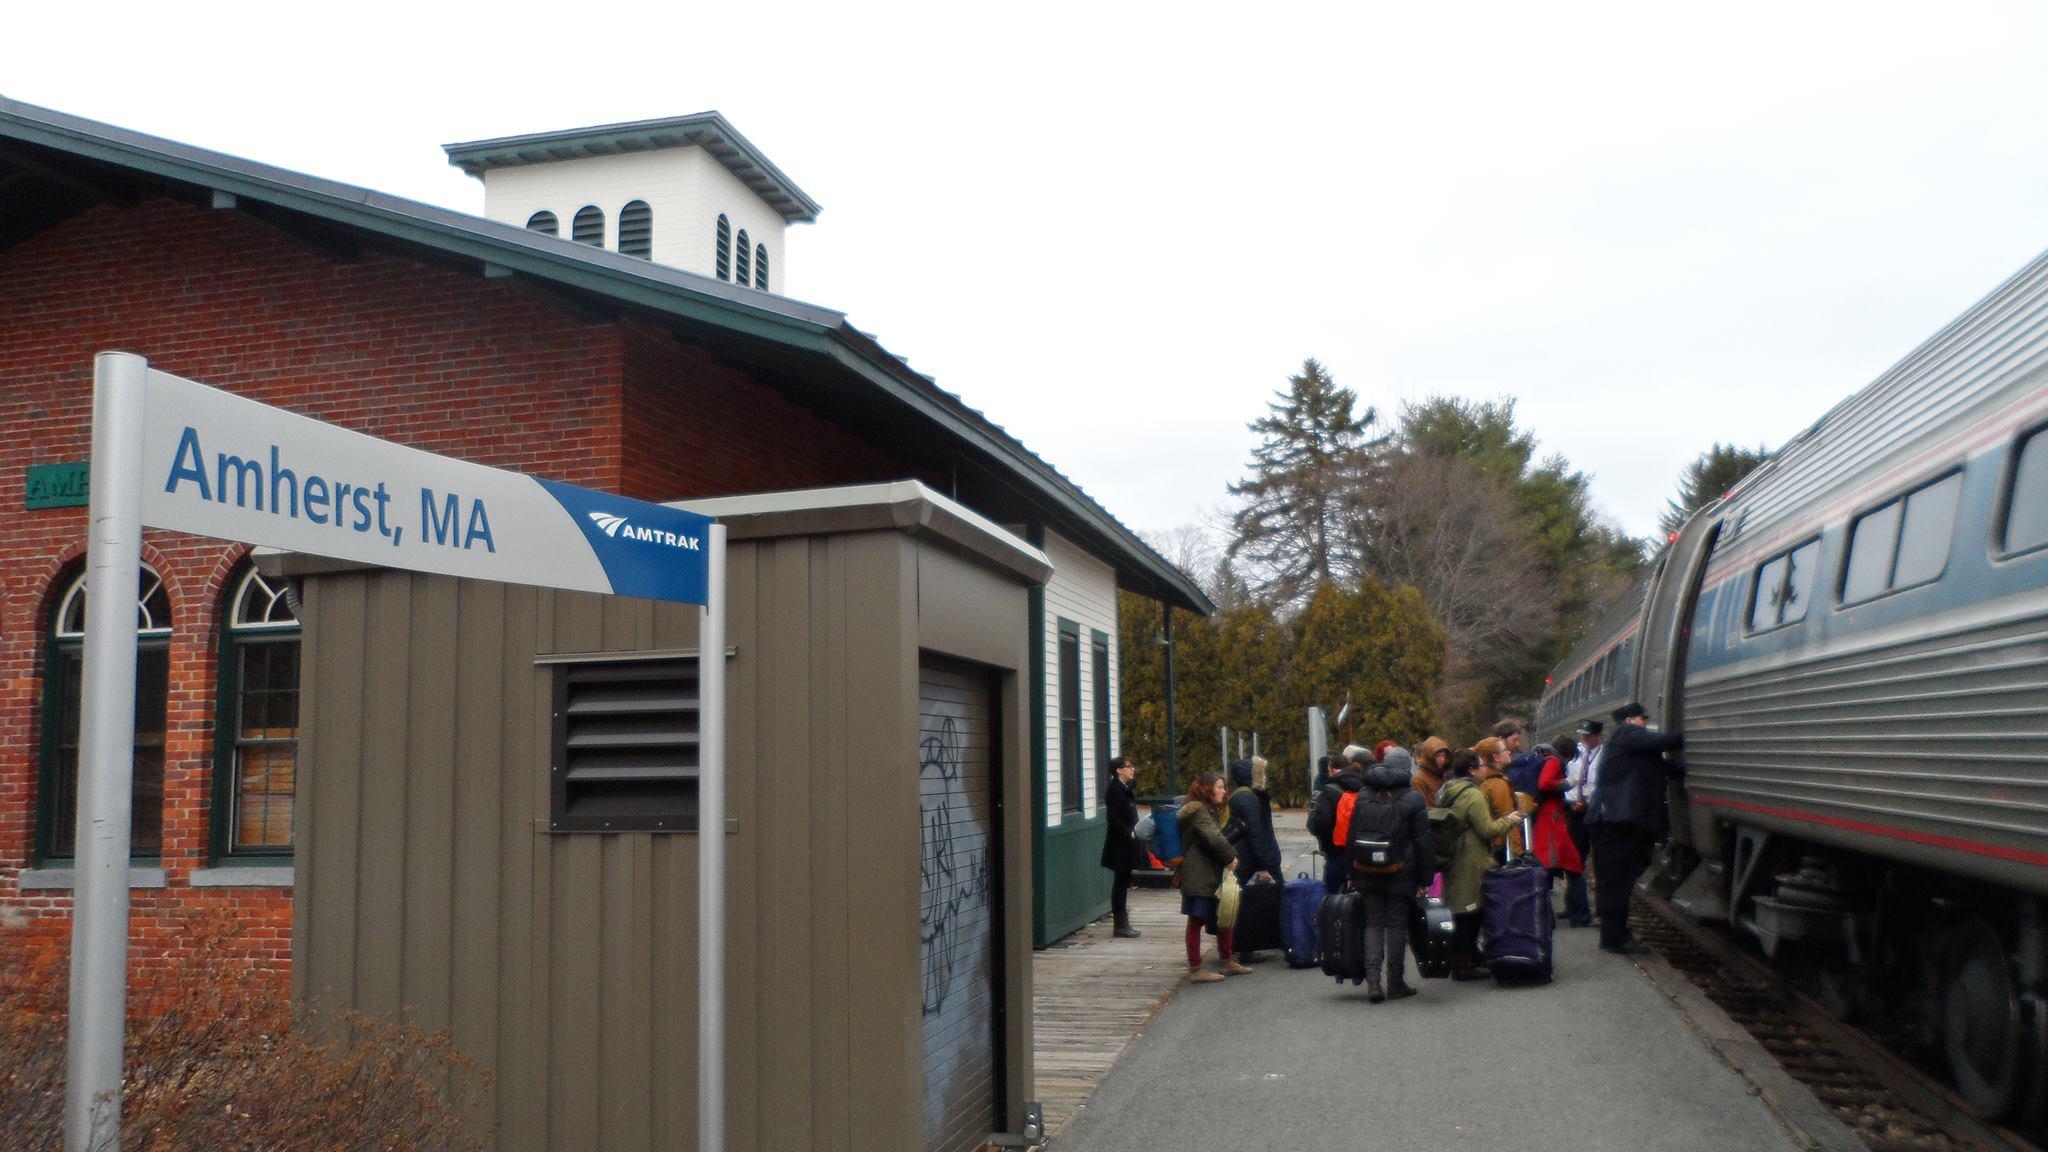 Vermonter pulls into Amherst station